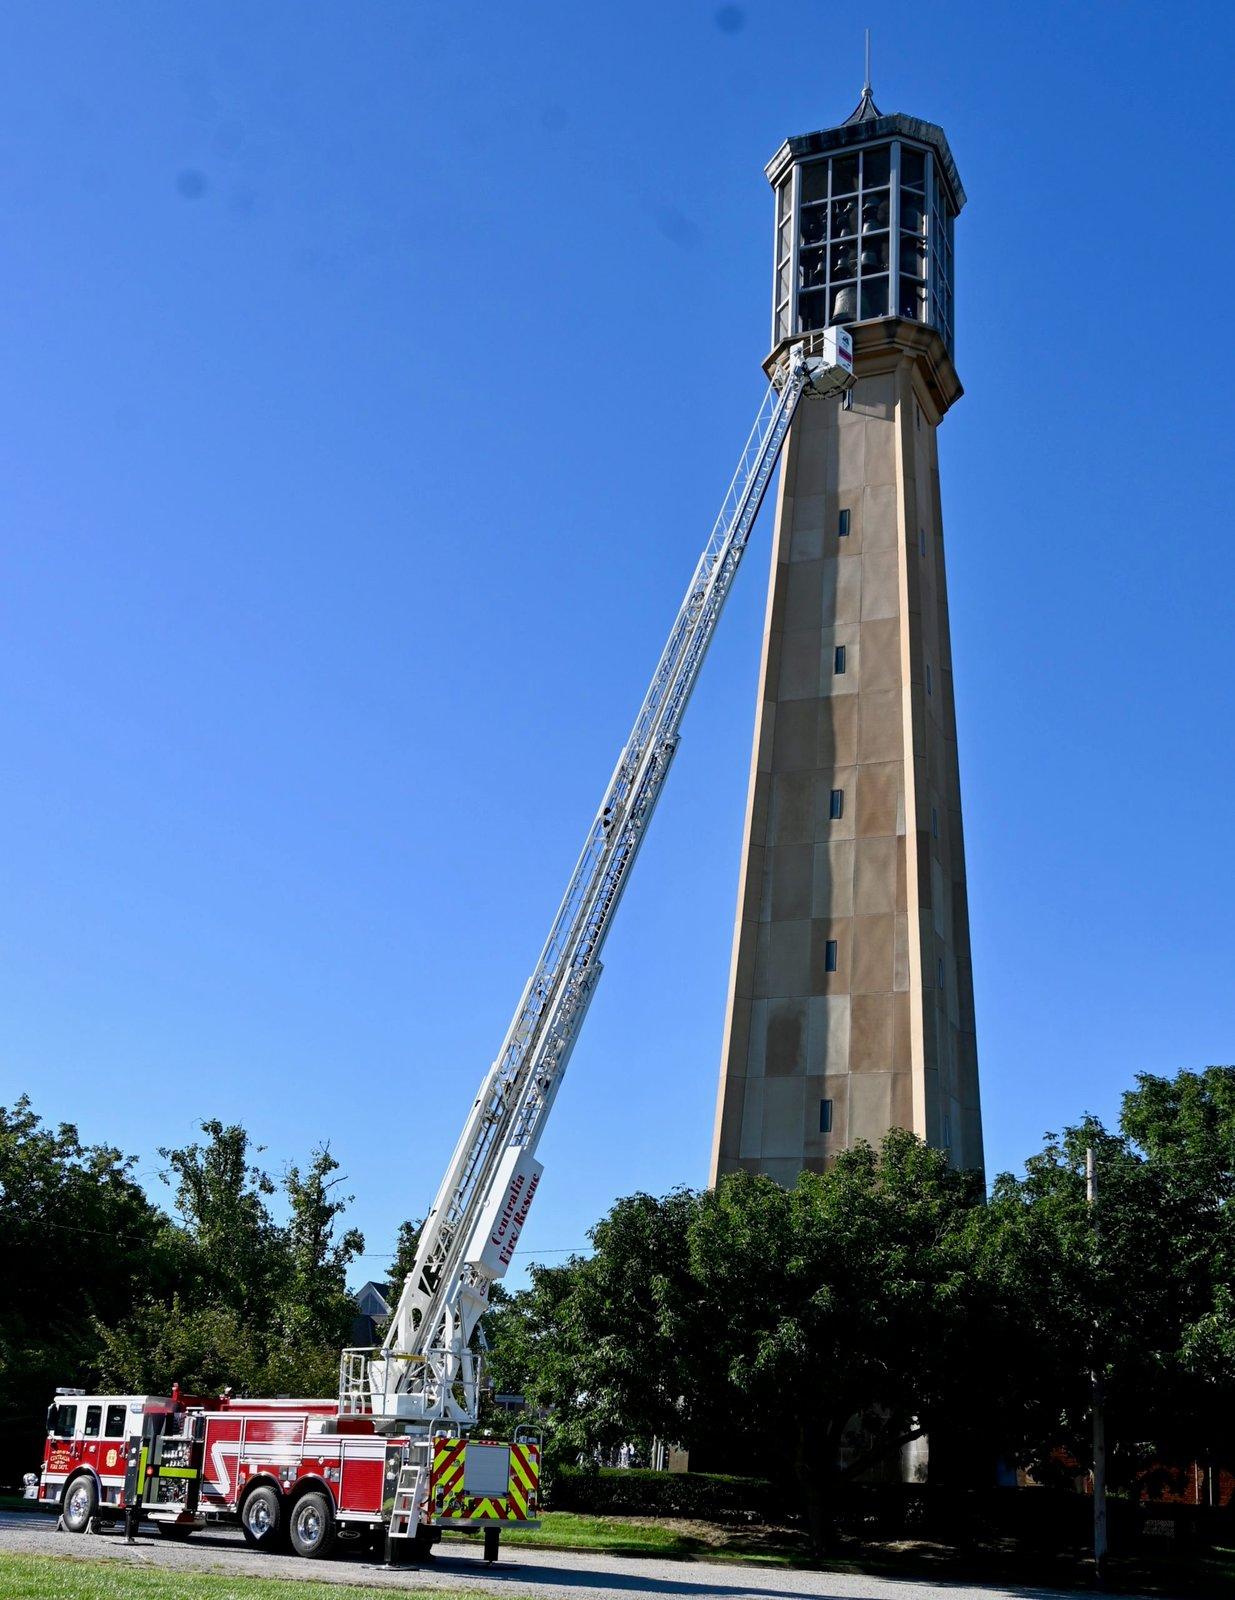 Centralia City Fire Department - Aerial